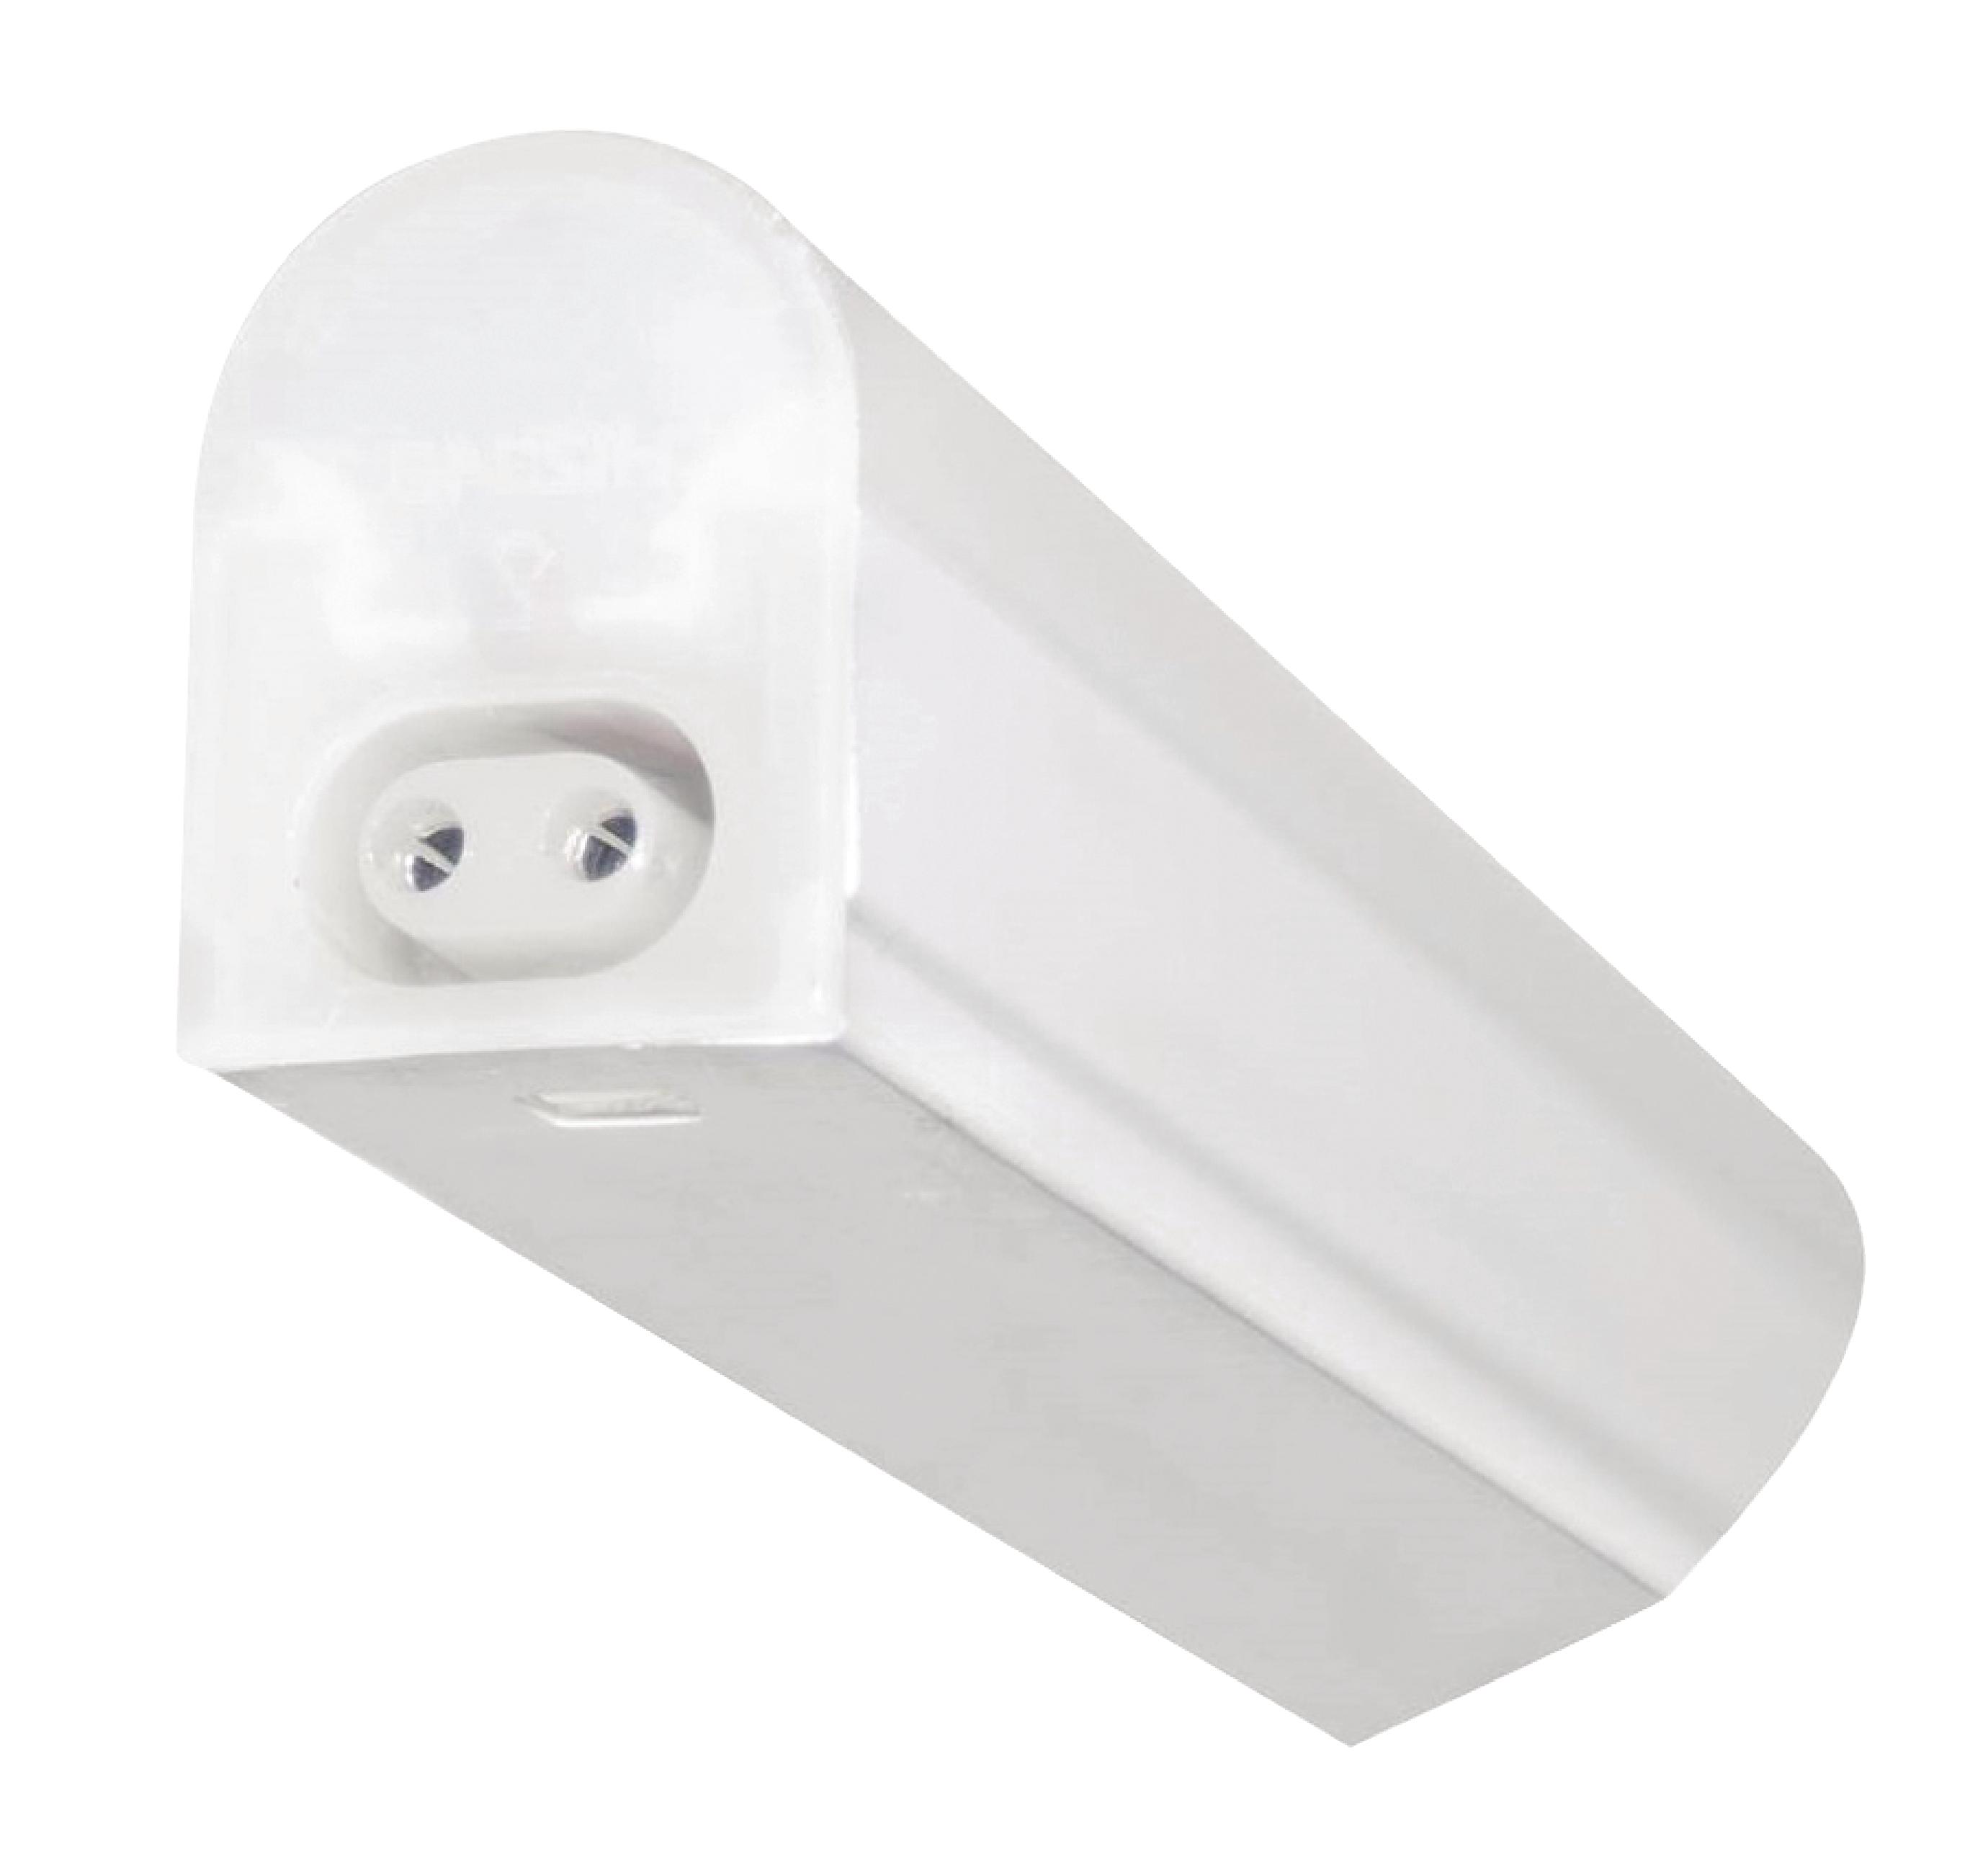 led-lampe-rohre-4-w-340-lm-4000-k